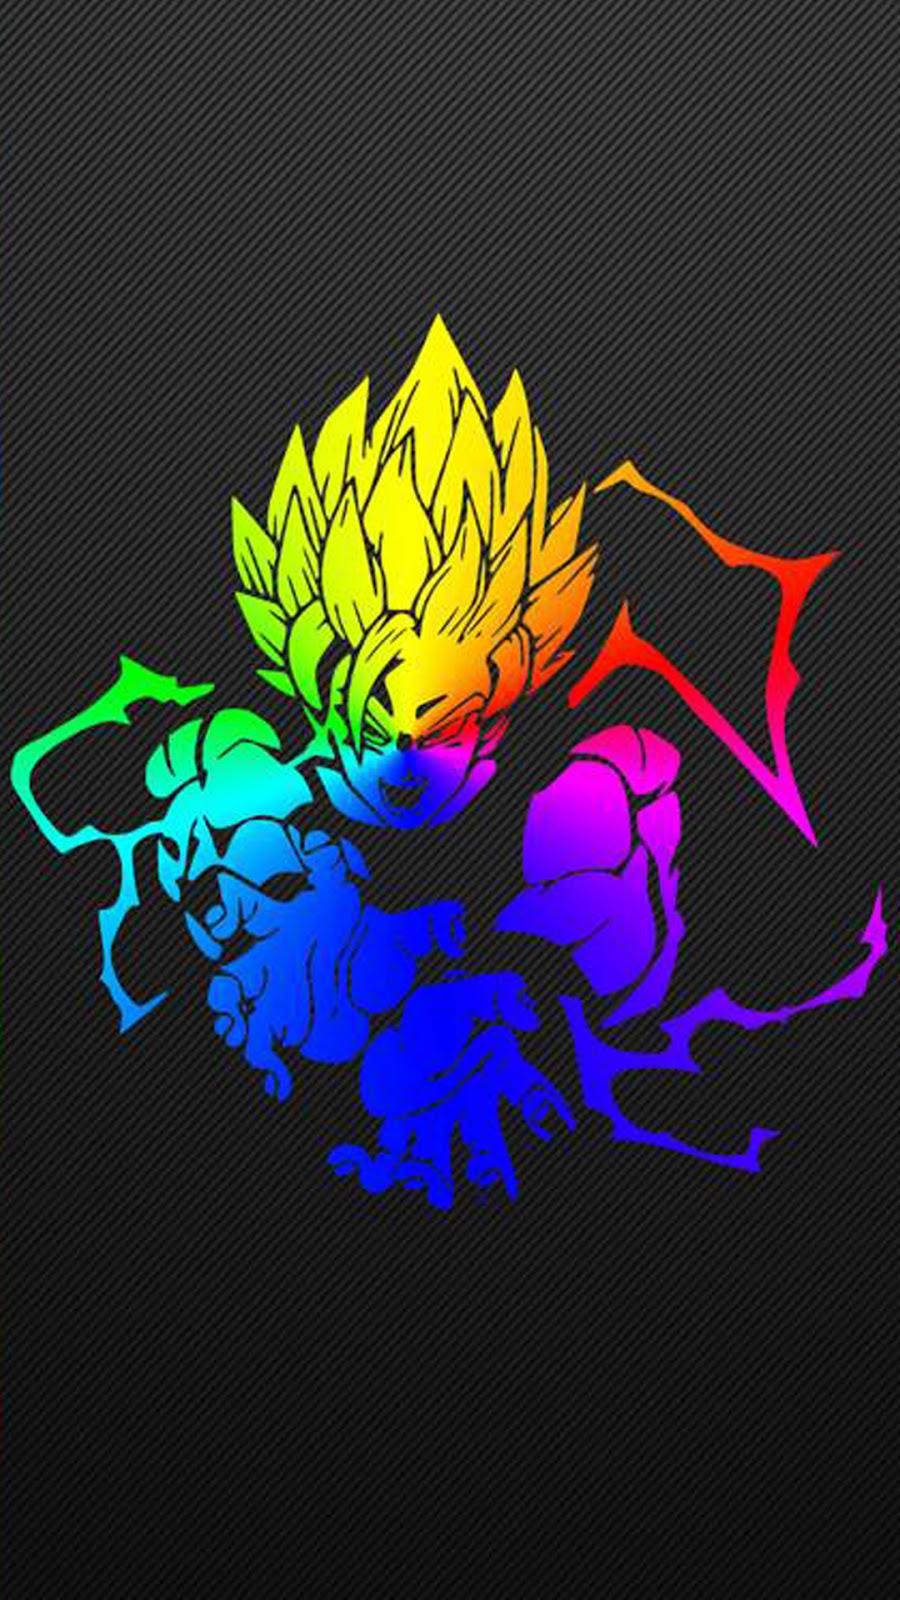 Colorfull Son Goku Super Dragon Ball Z Wallpaper Hd